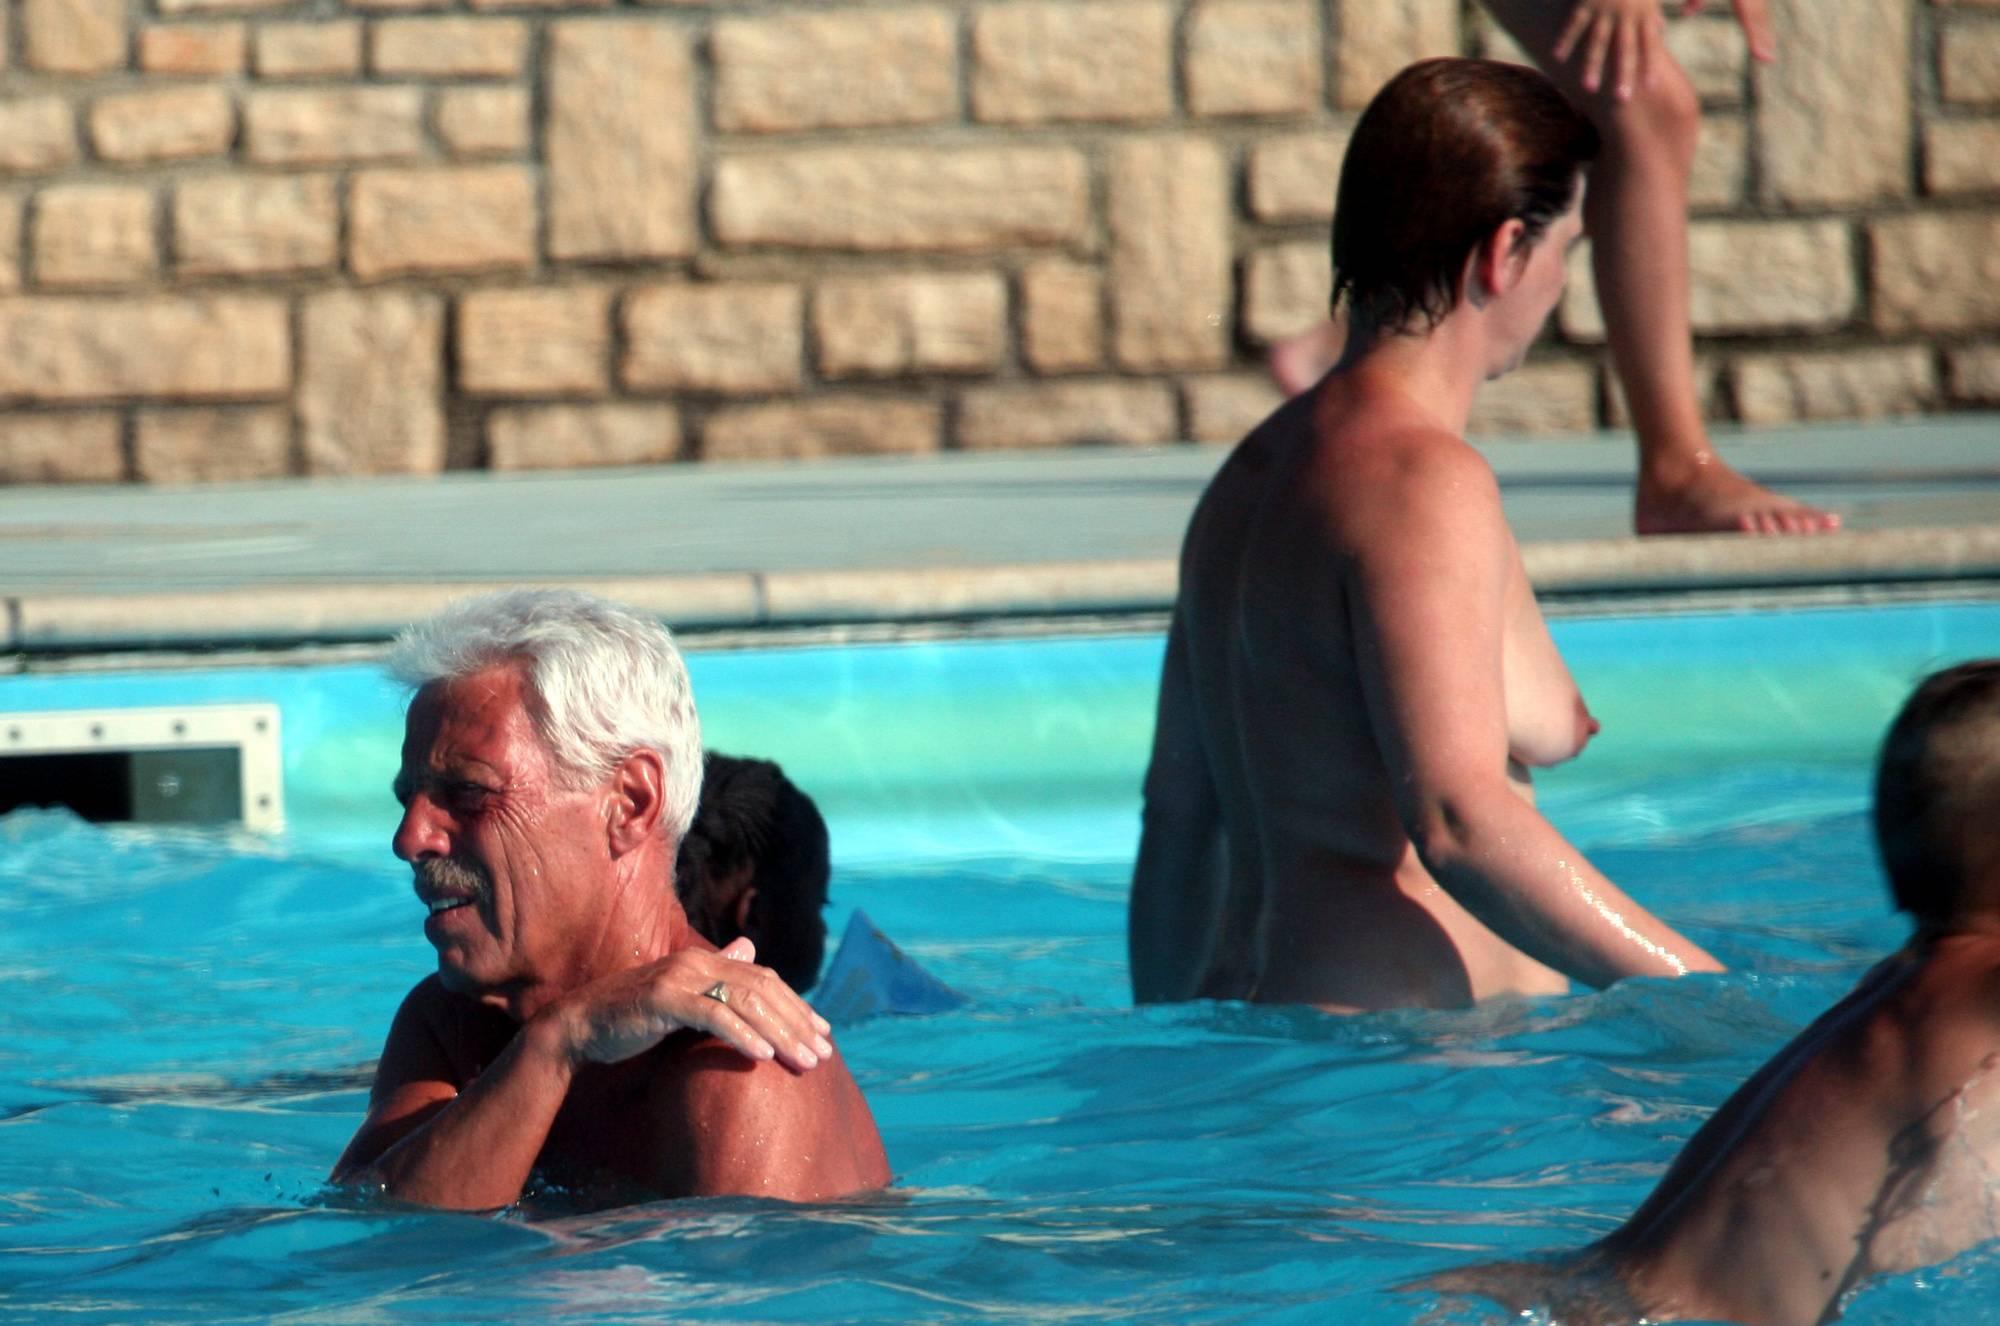 Pure Nudism Photos Nudist In-Pool Assortment - 2